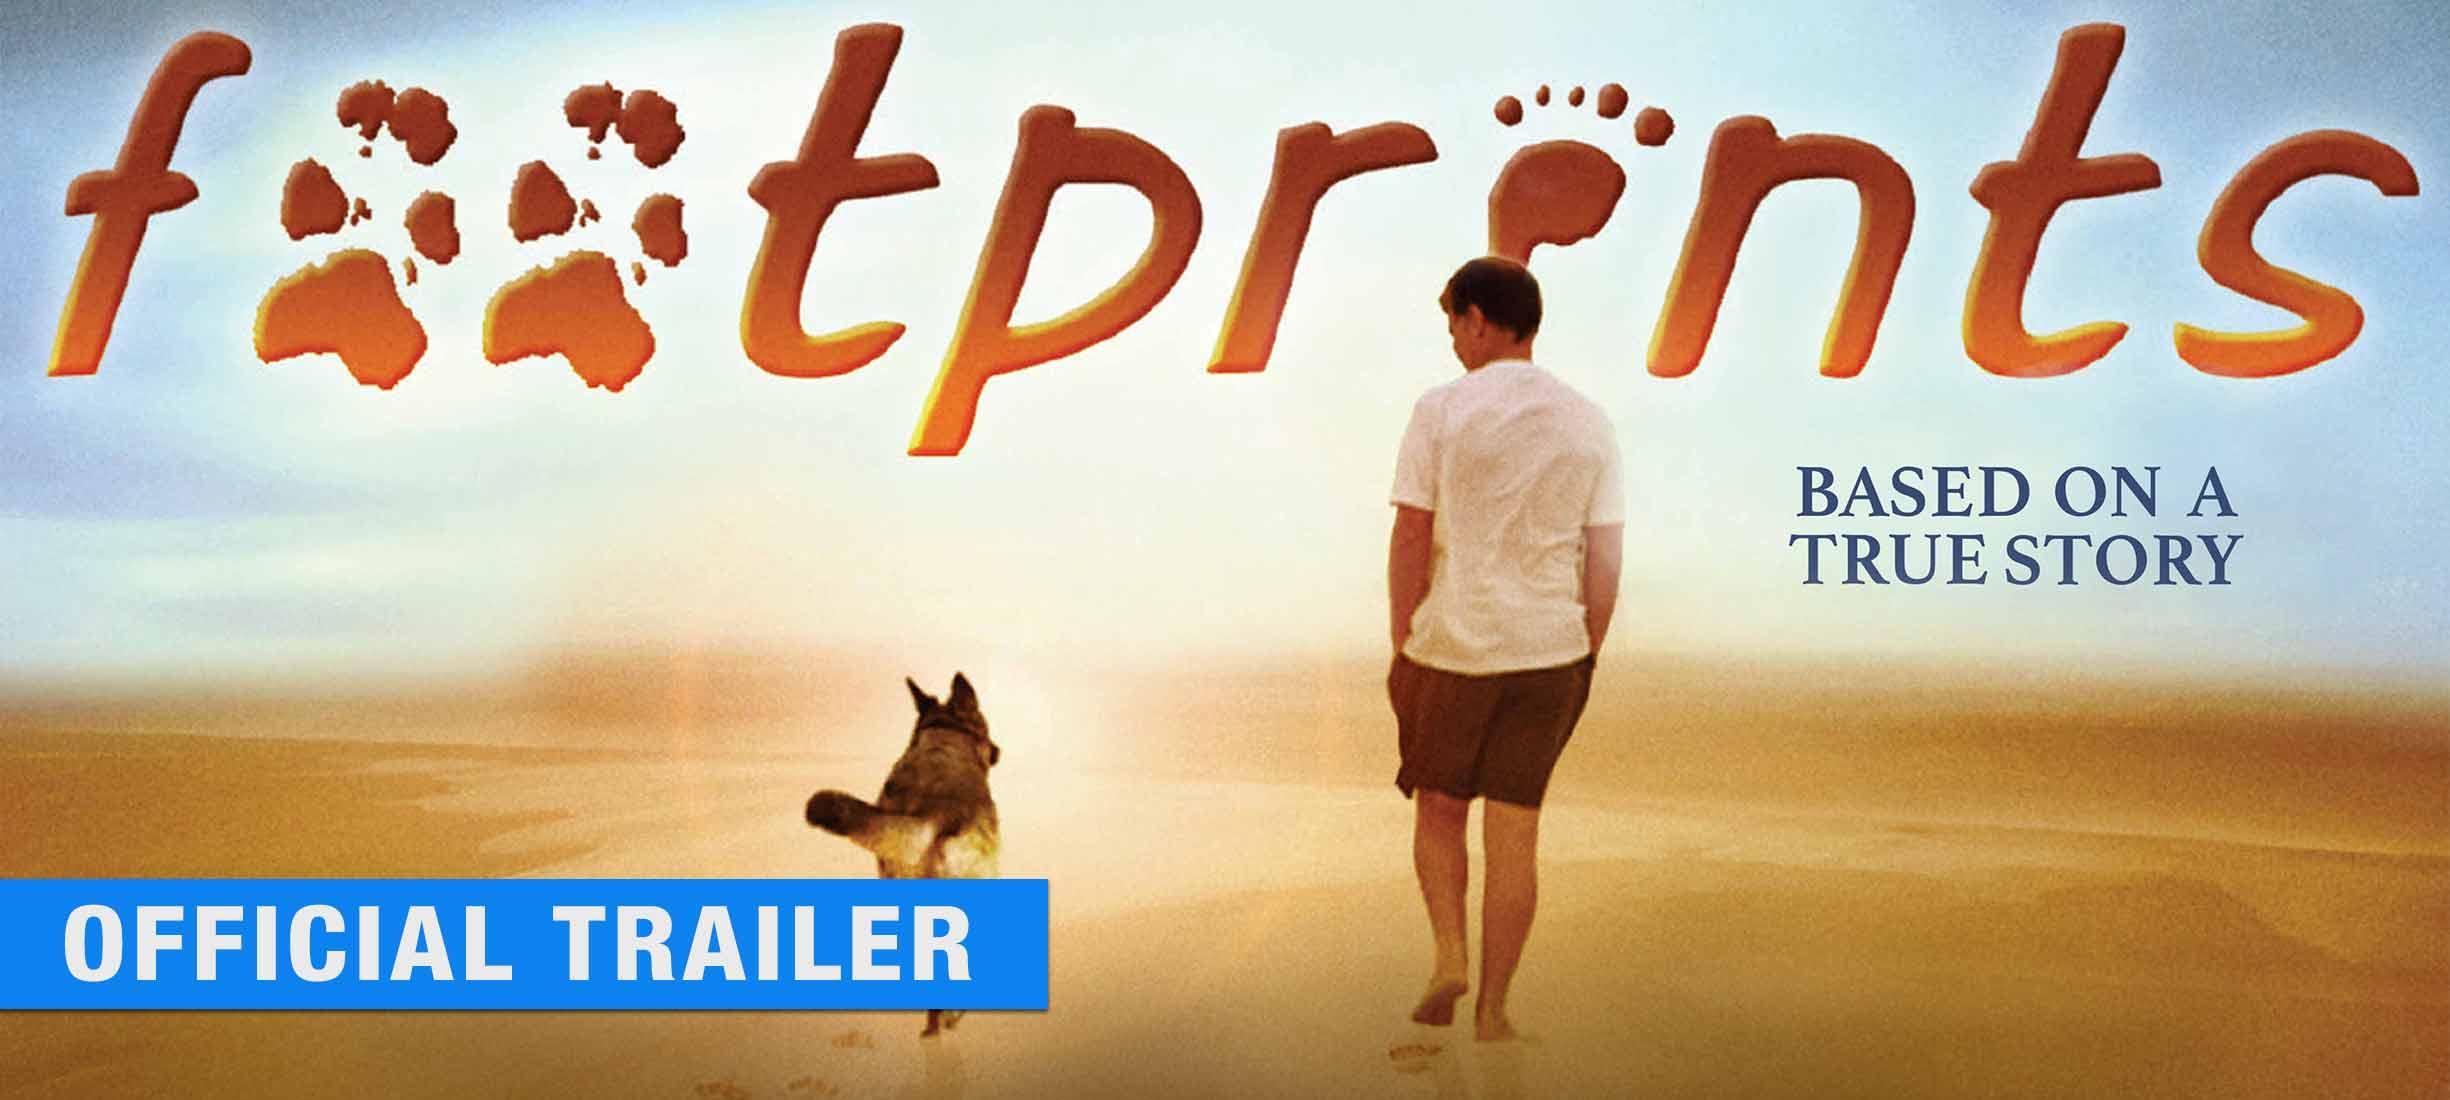 Footprints: Trailer